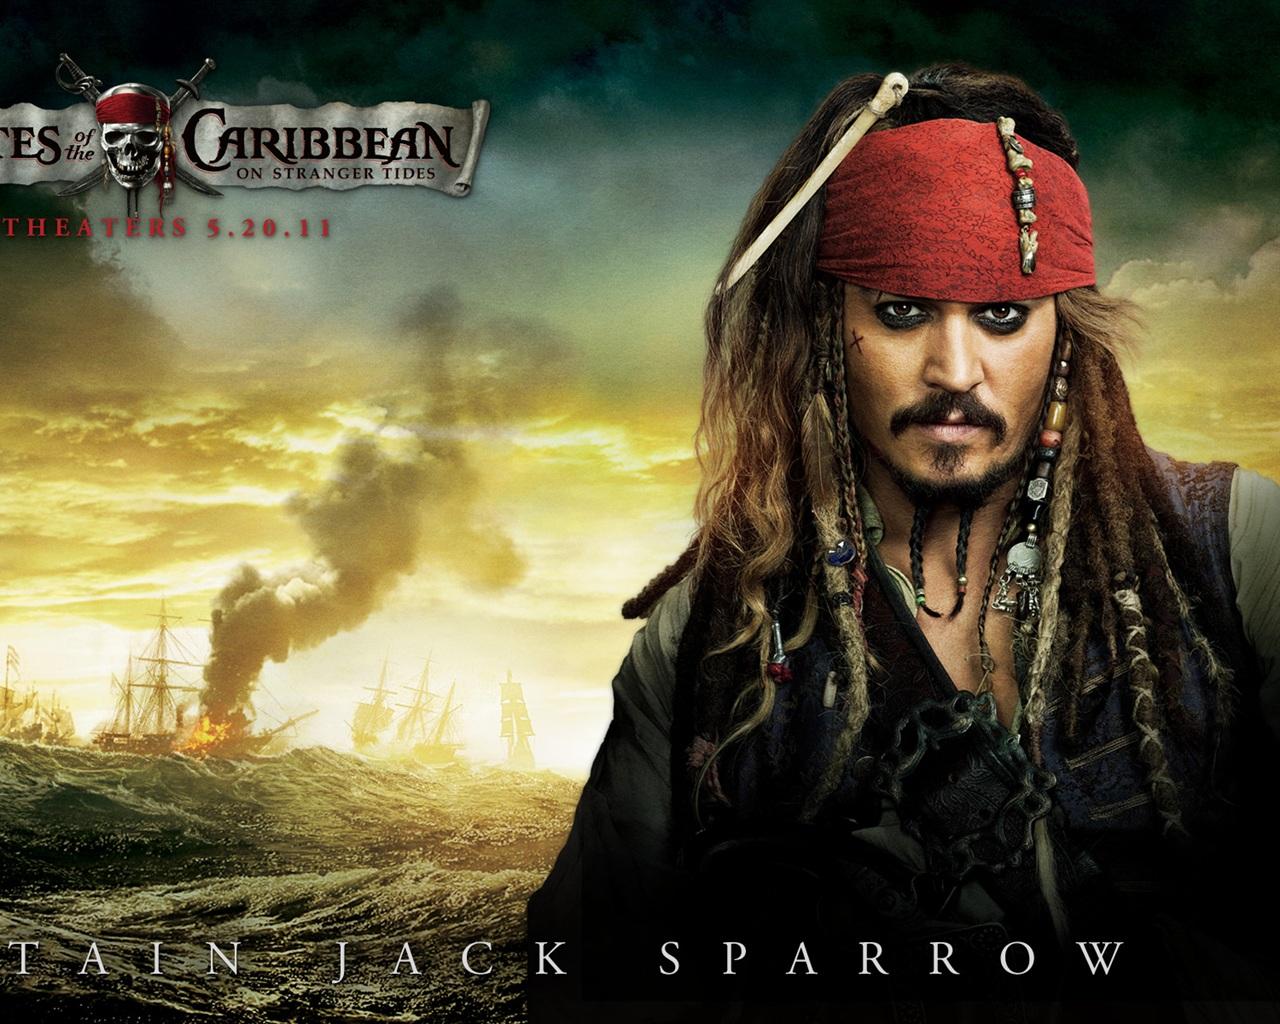 Pirates of the caribbean 4 captain jack sparrow1280x1024